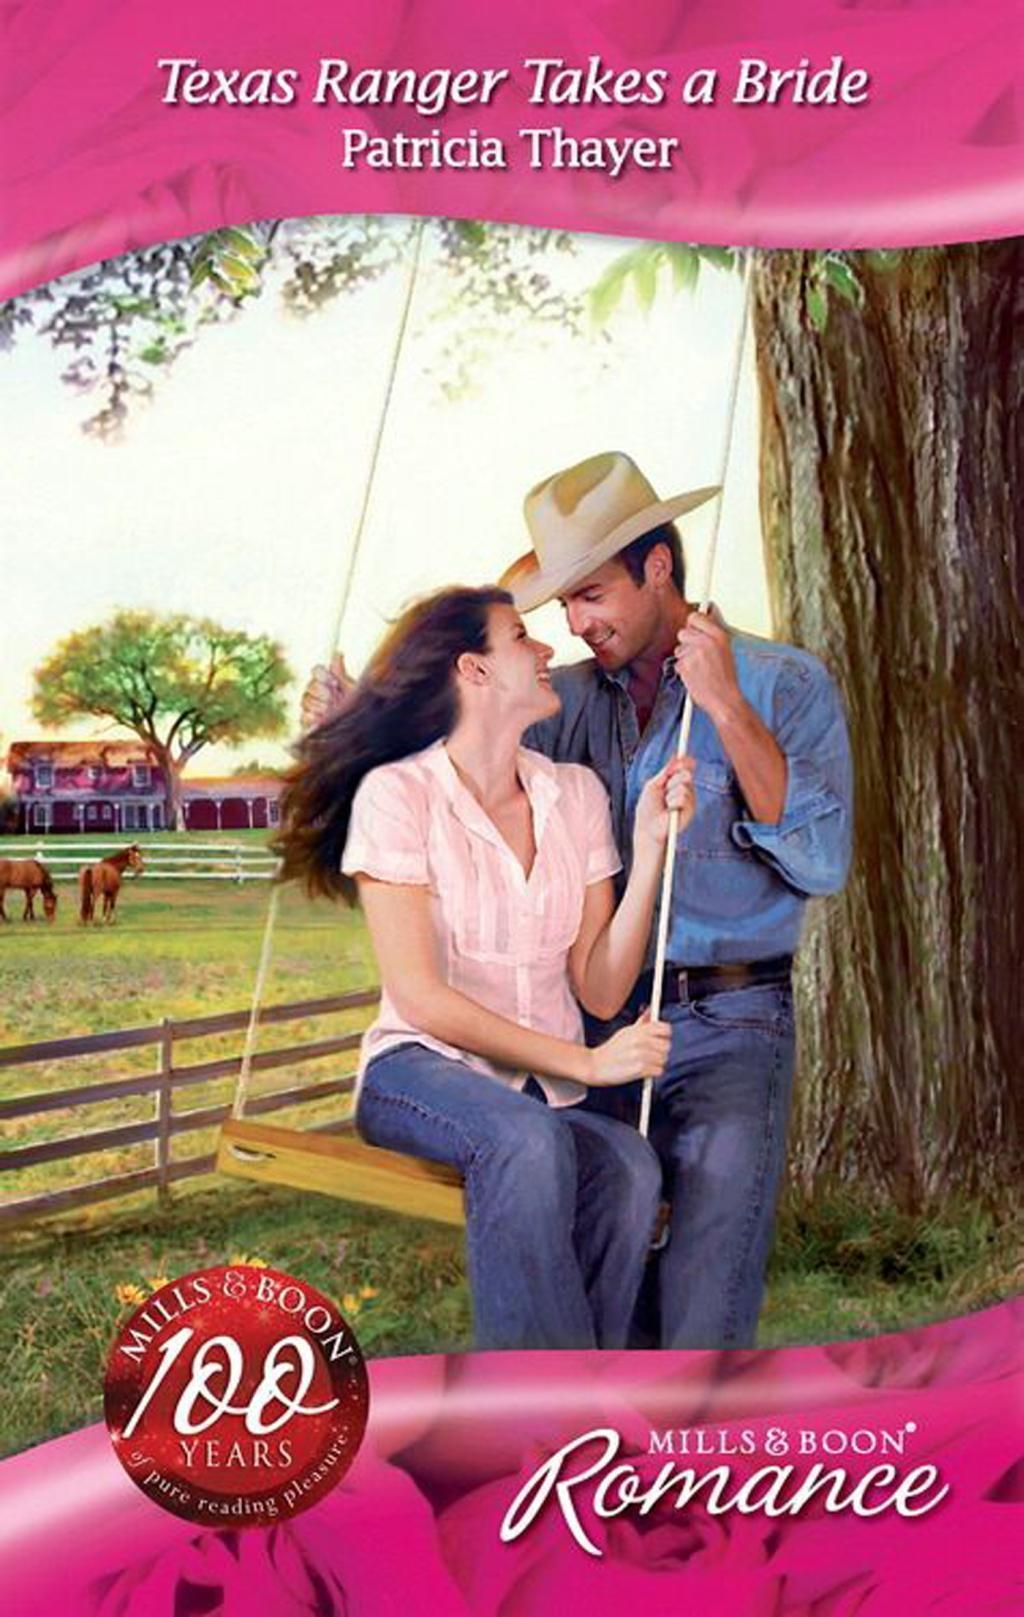 Texas Ranger Takes a Bride (Mills & Boon Romance)